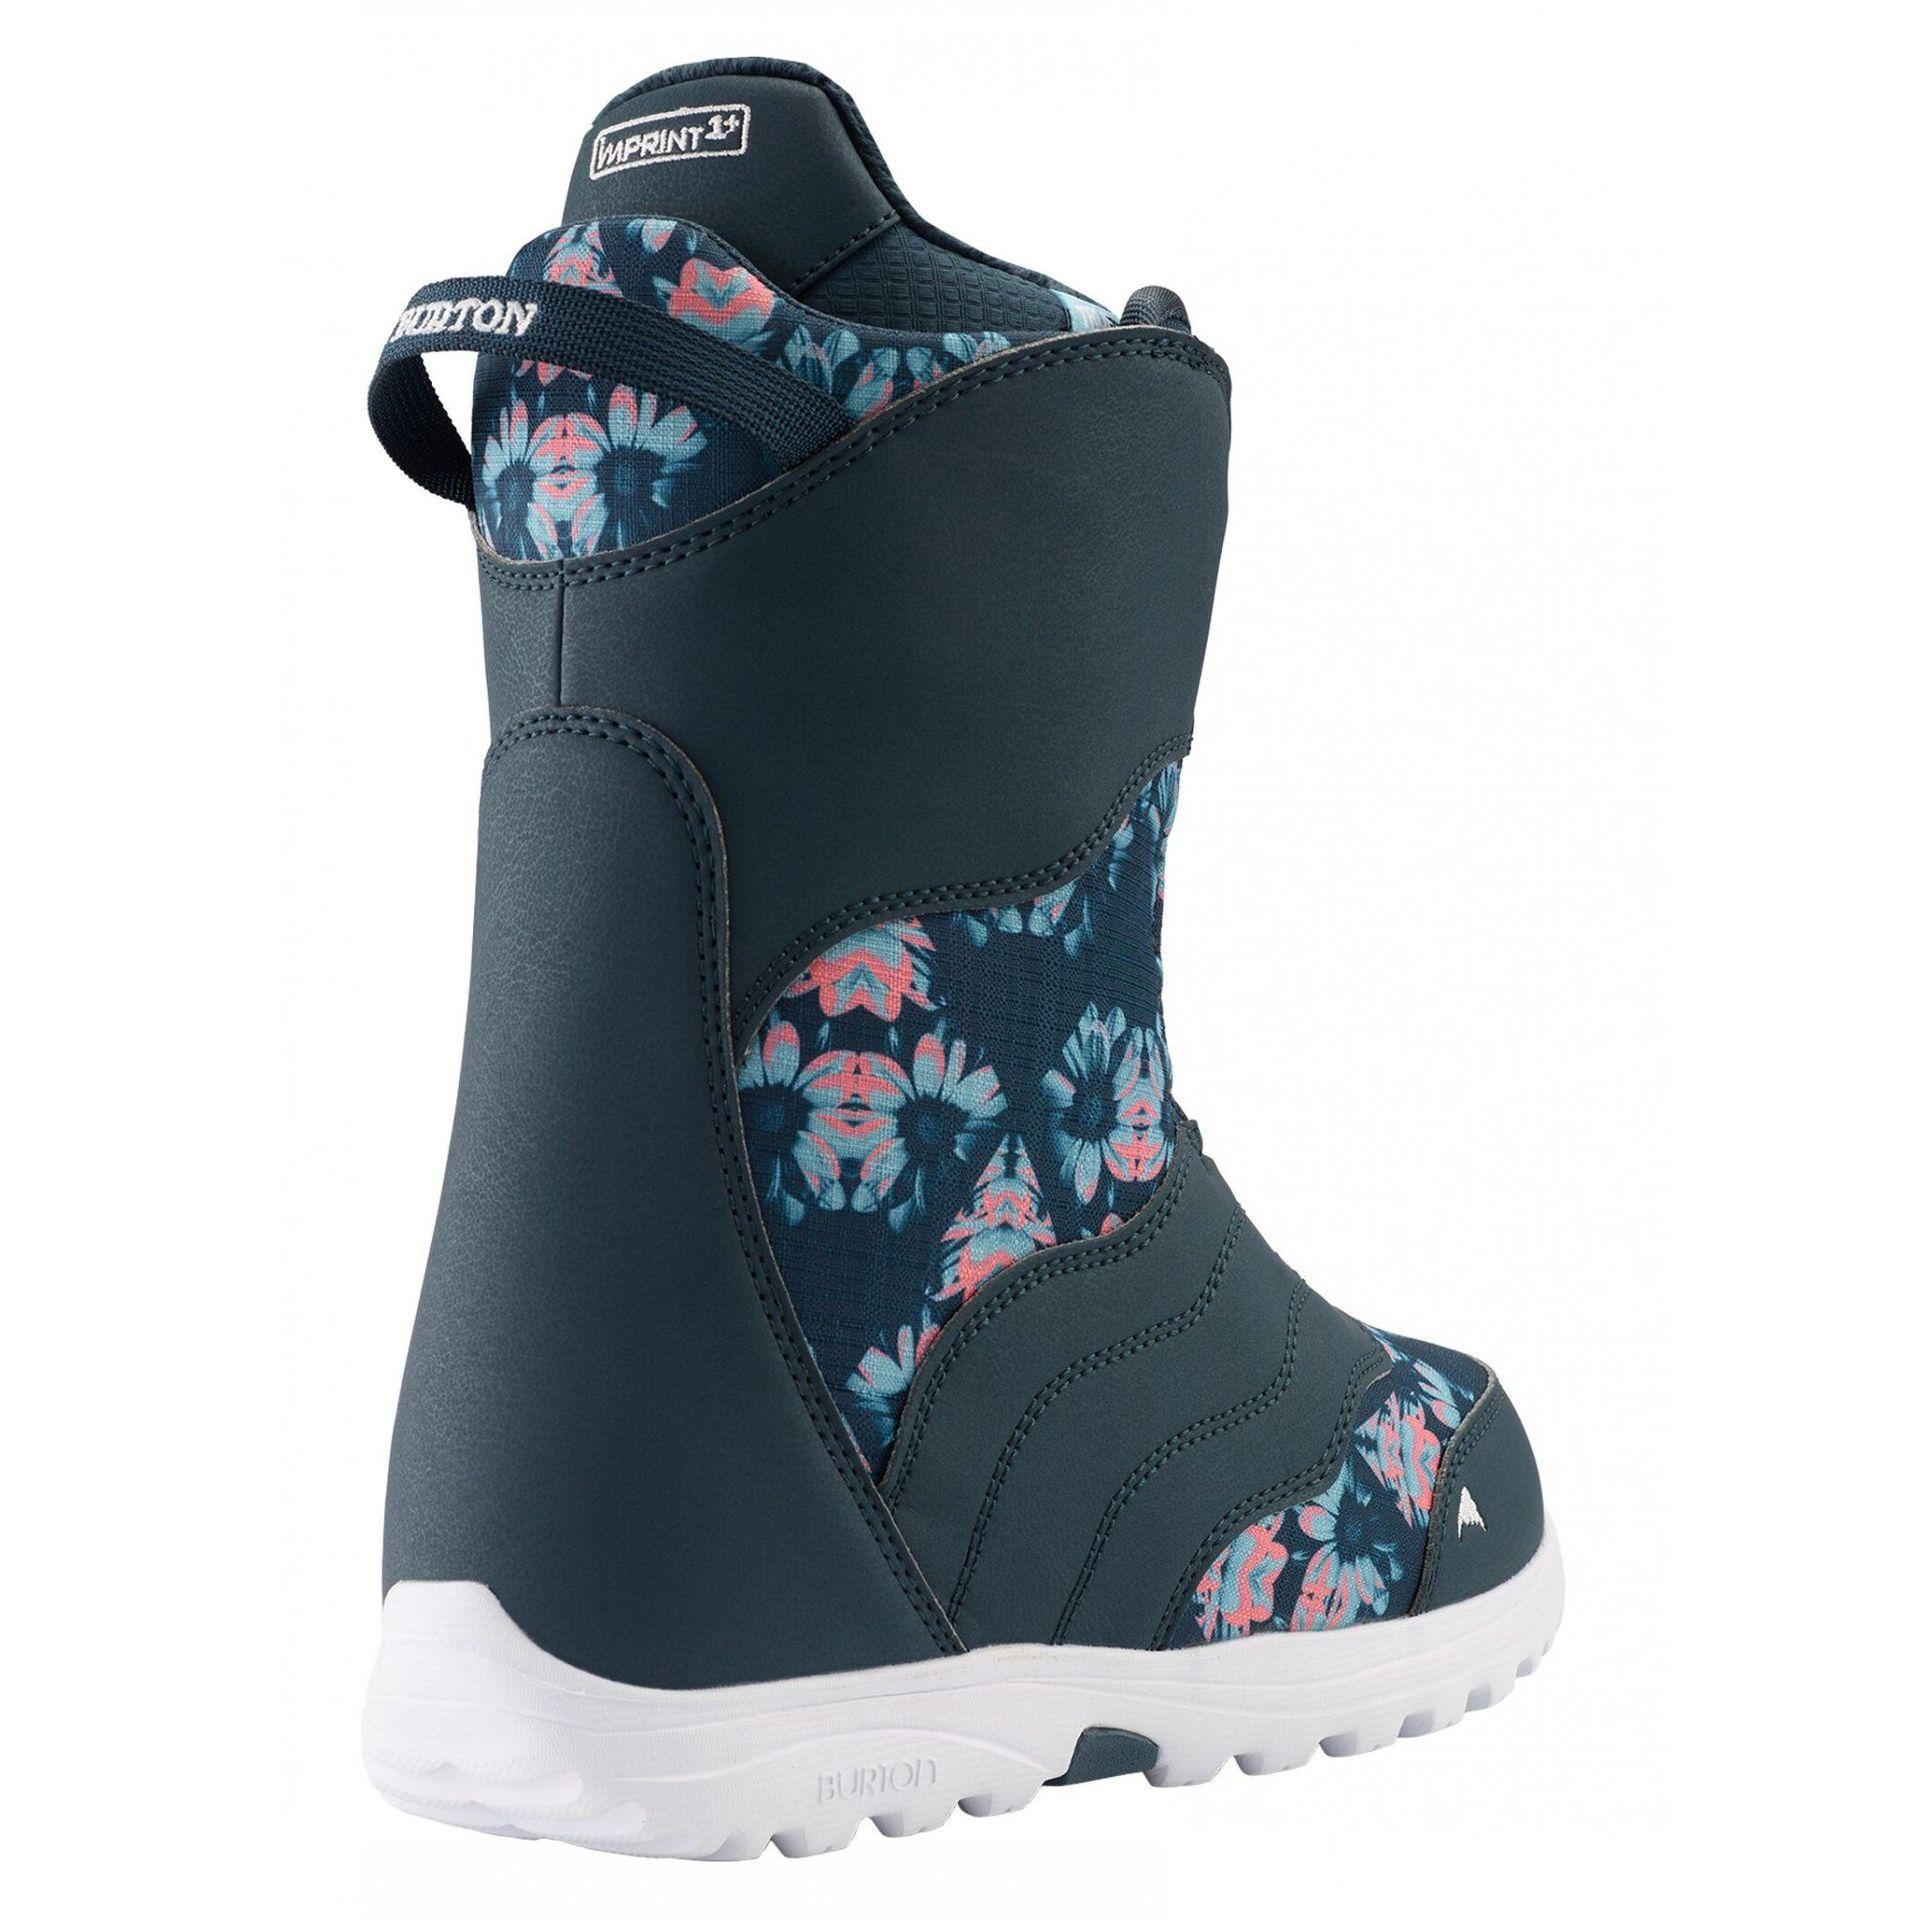 BUTY SNOWBOARDOWE BURTON MINT BOA MIDNITE BLUE|MULTI 131771-423 2